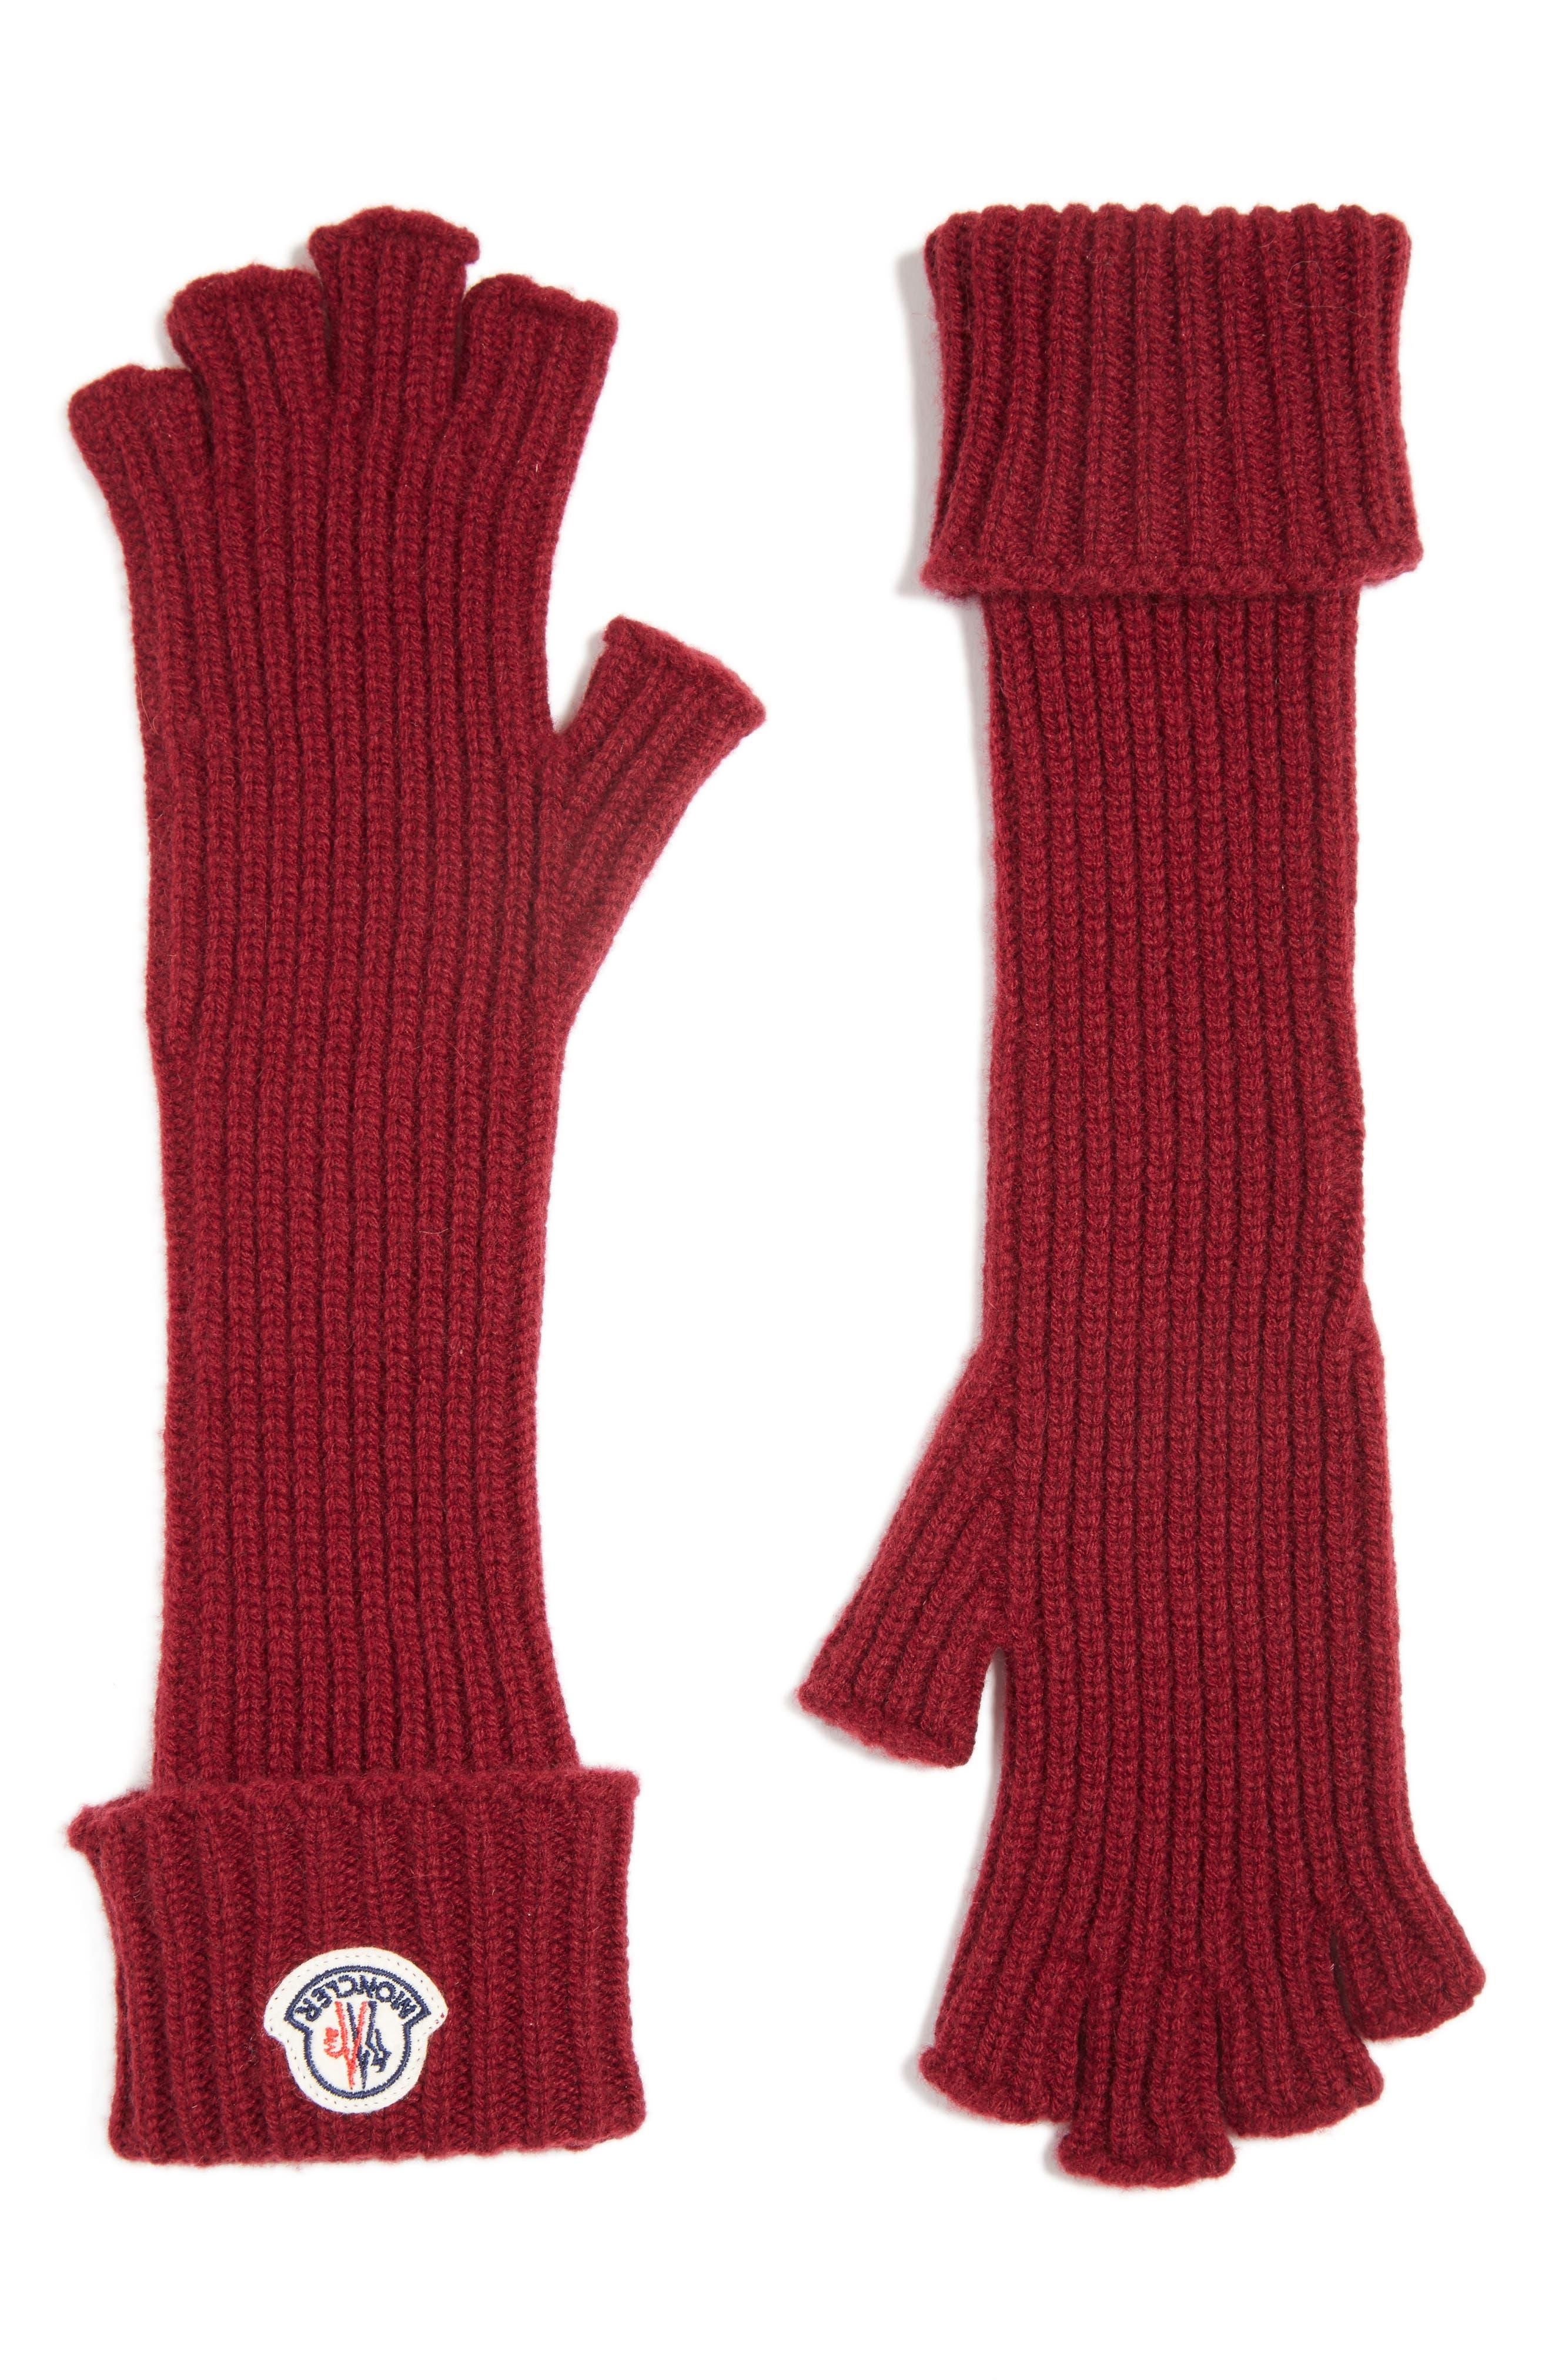 Guanti Wool & Cashmere Long Fingerless Gloves,                             Alternate thumbnail 2, color,                             BURGUNDY